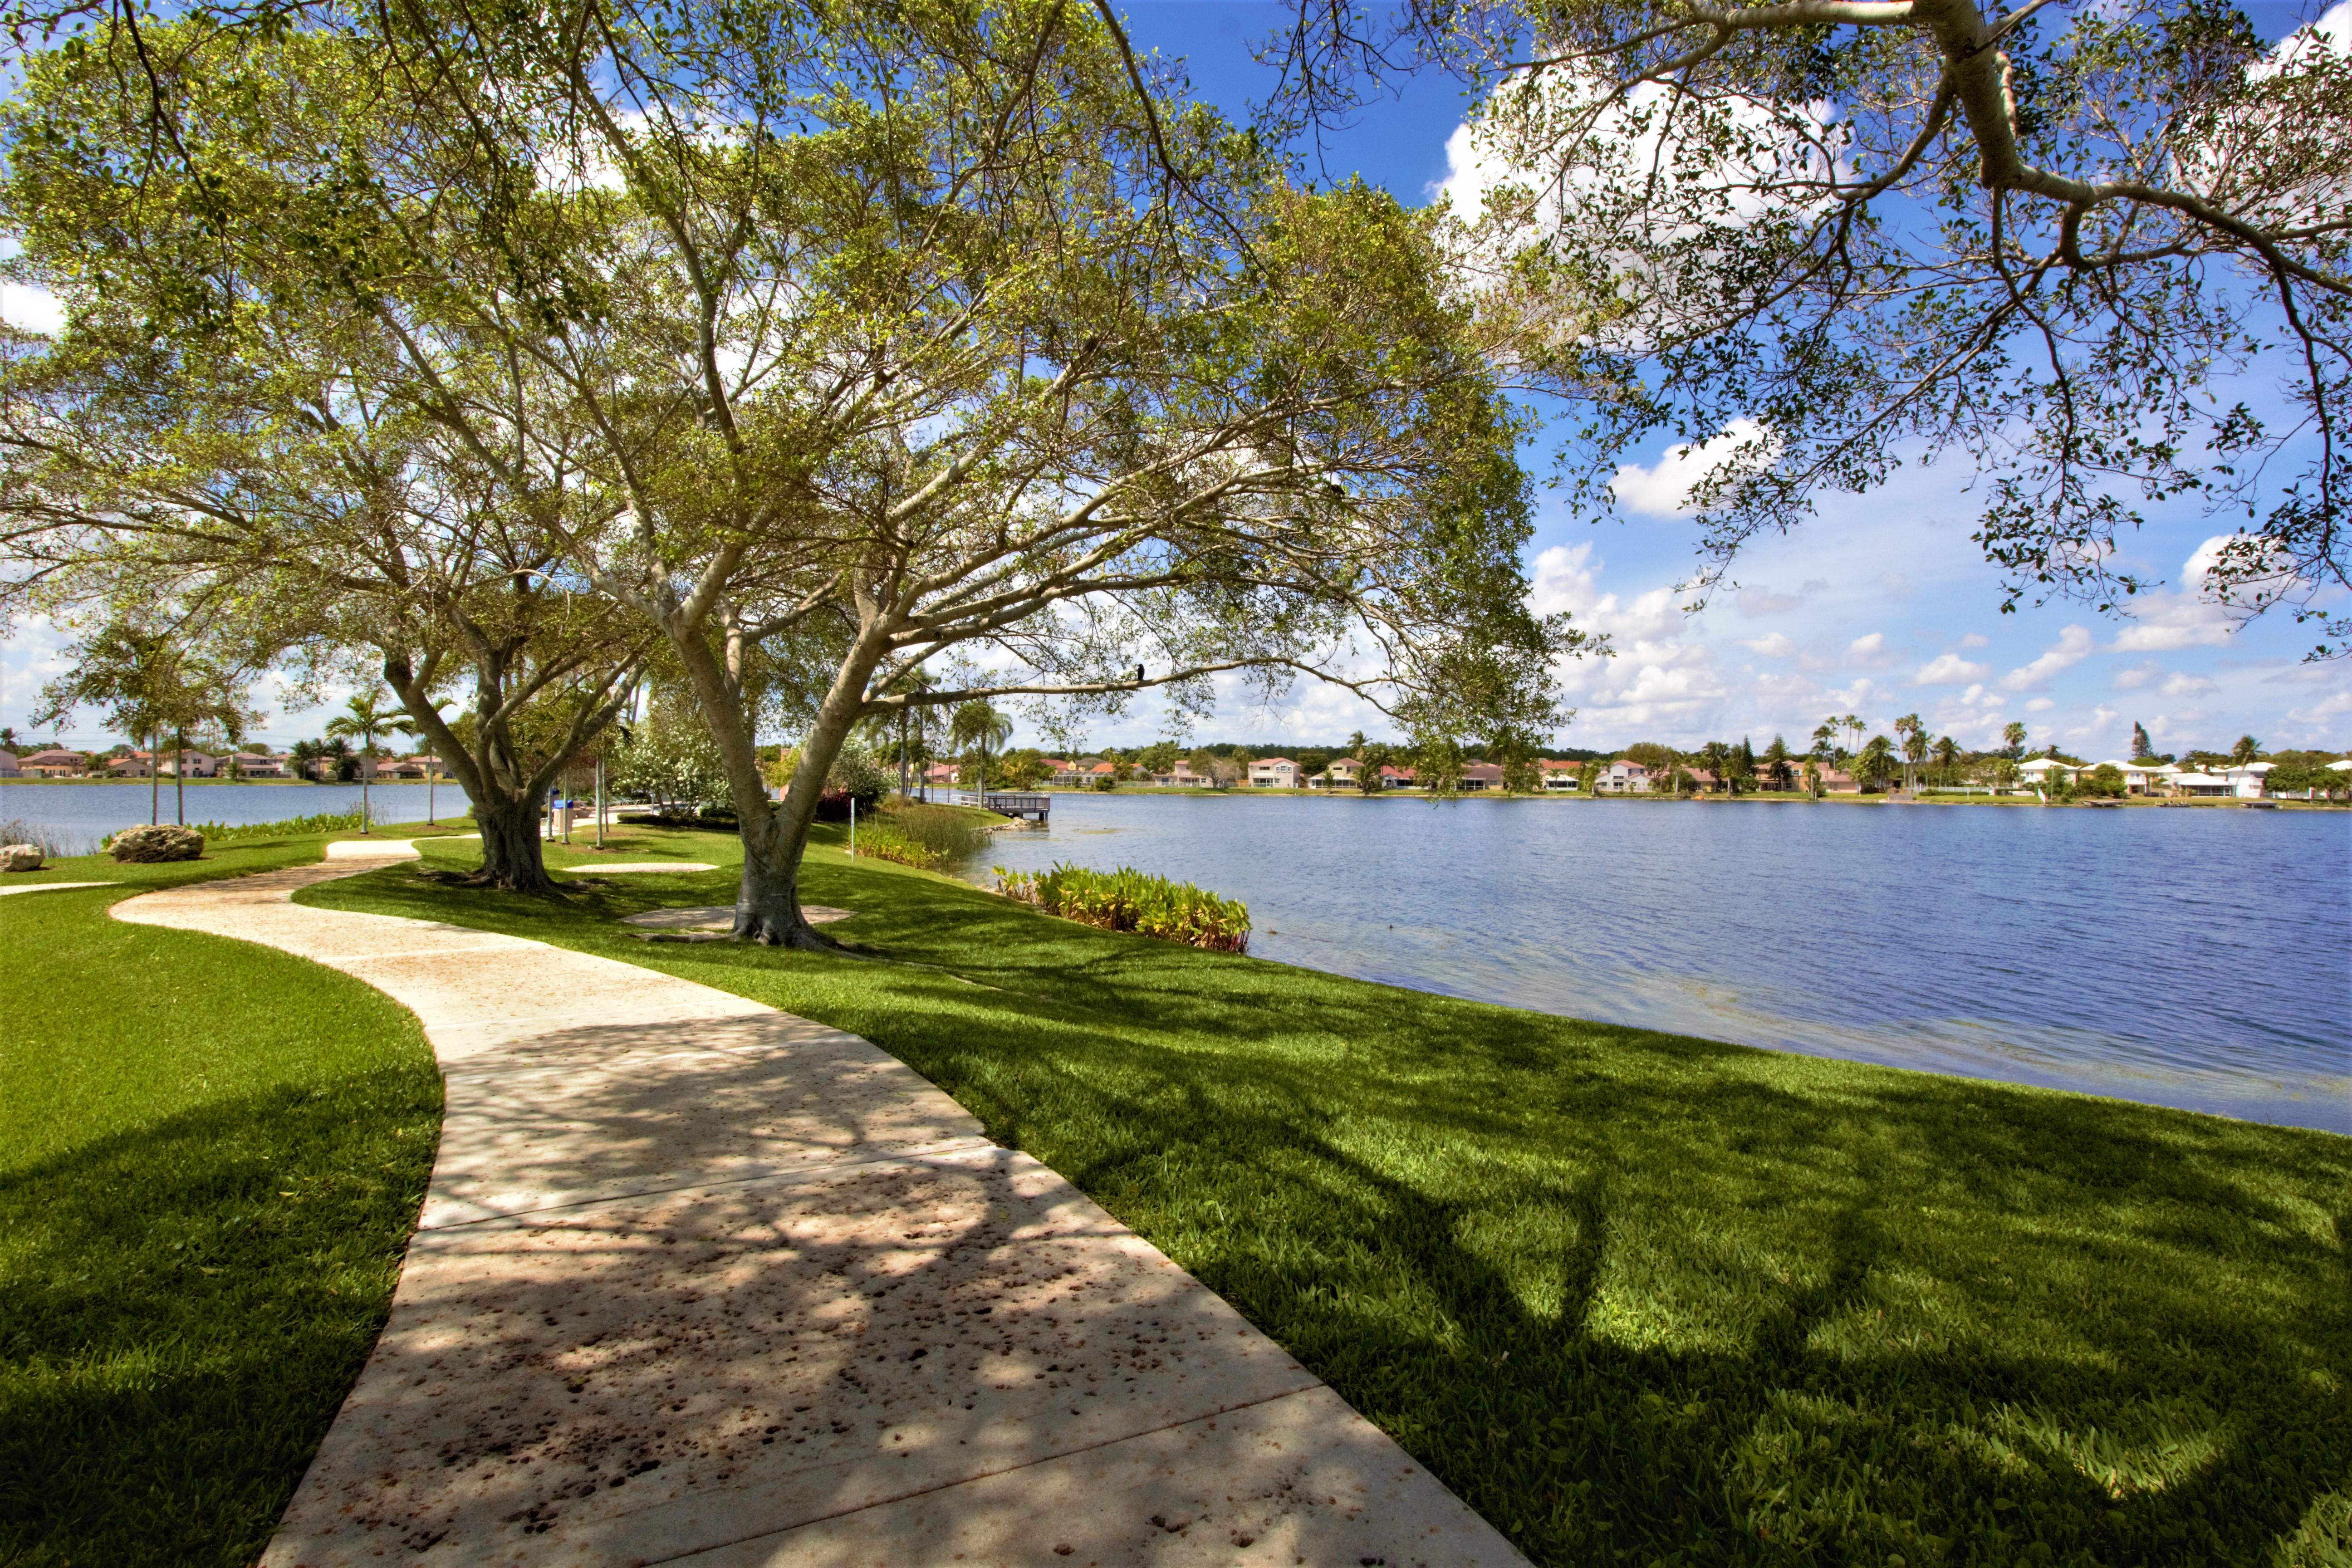 Coral Bay Walkway